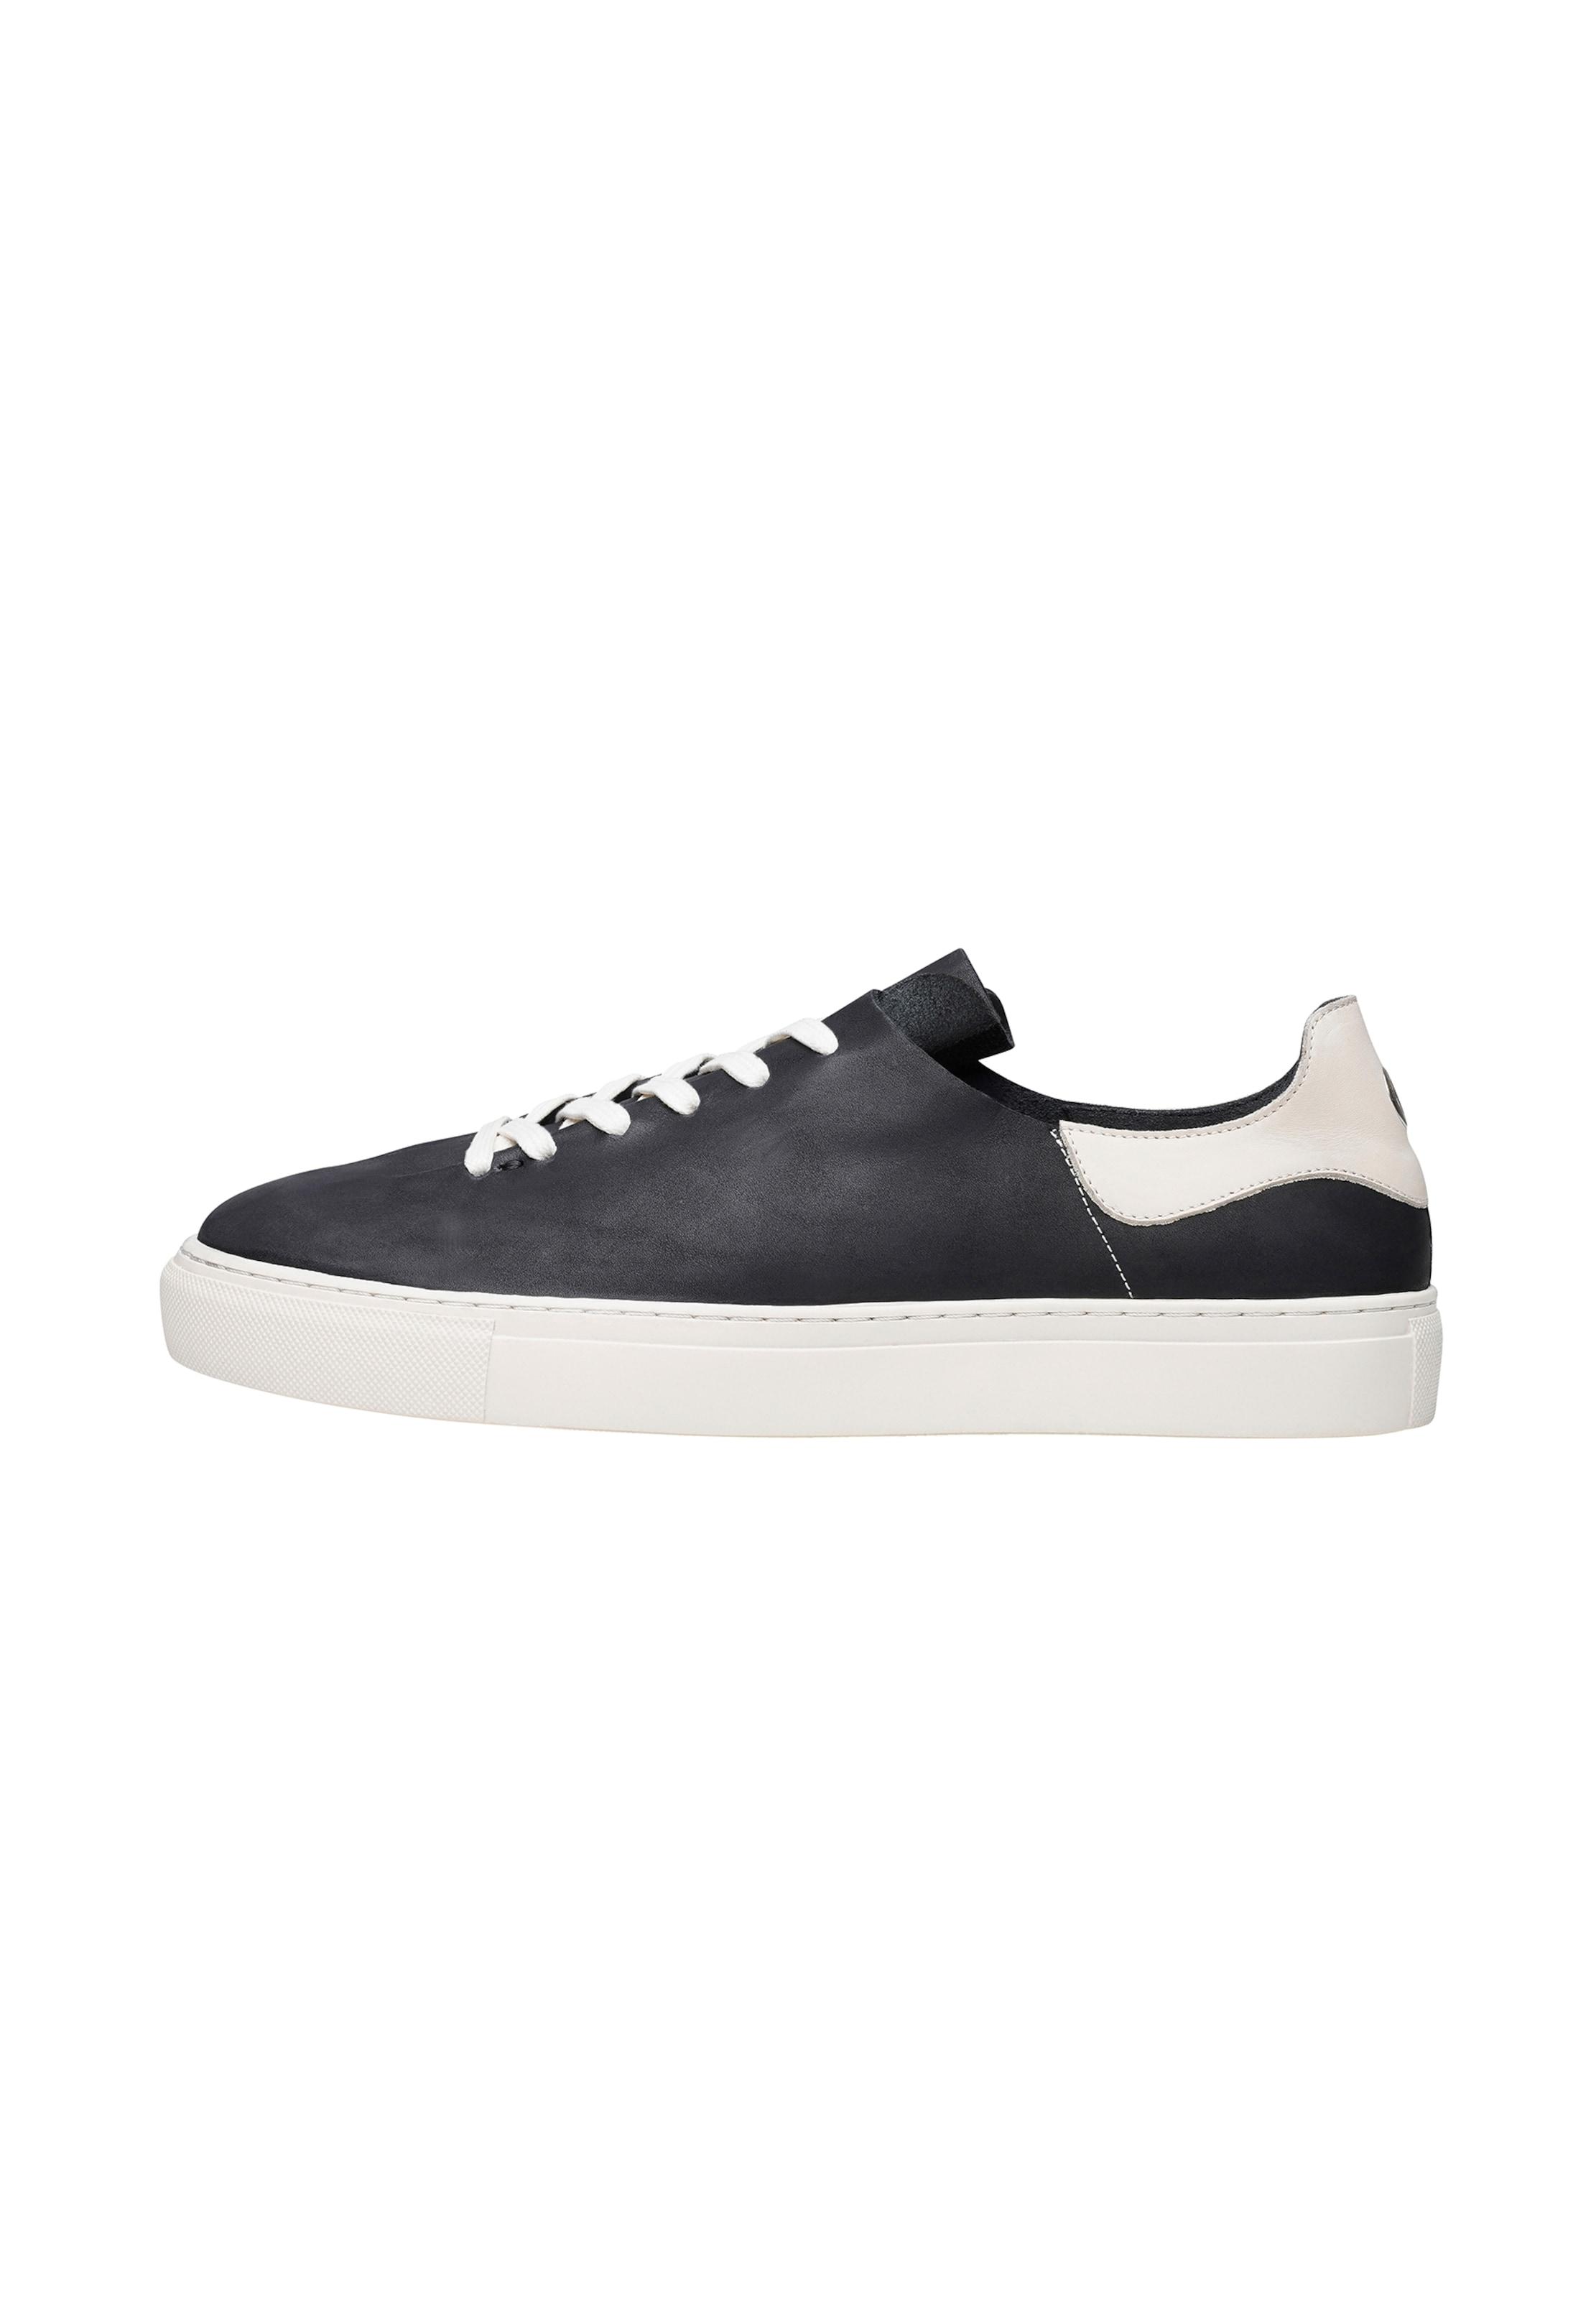 Sneaker ' Shoepassion In SchwarzWeiß 'no82 Ms hQrCdsxtB